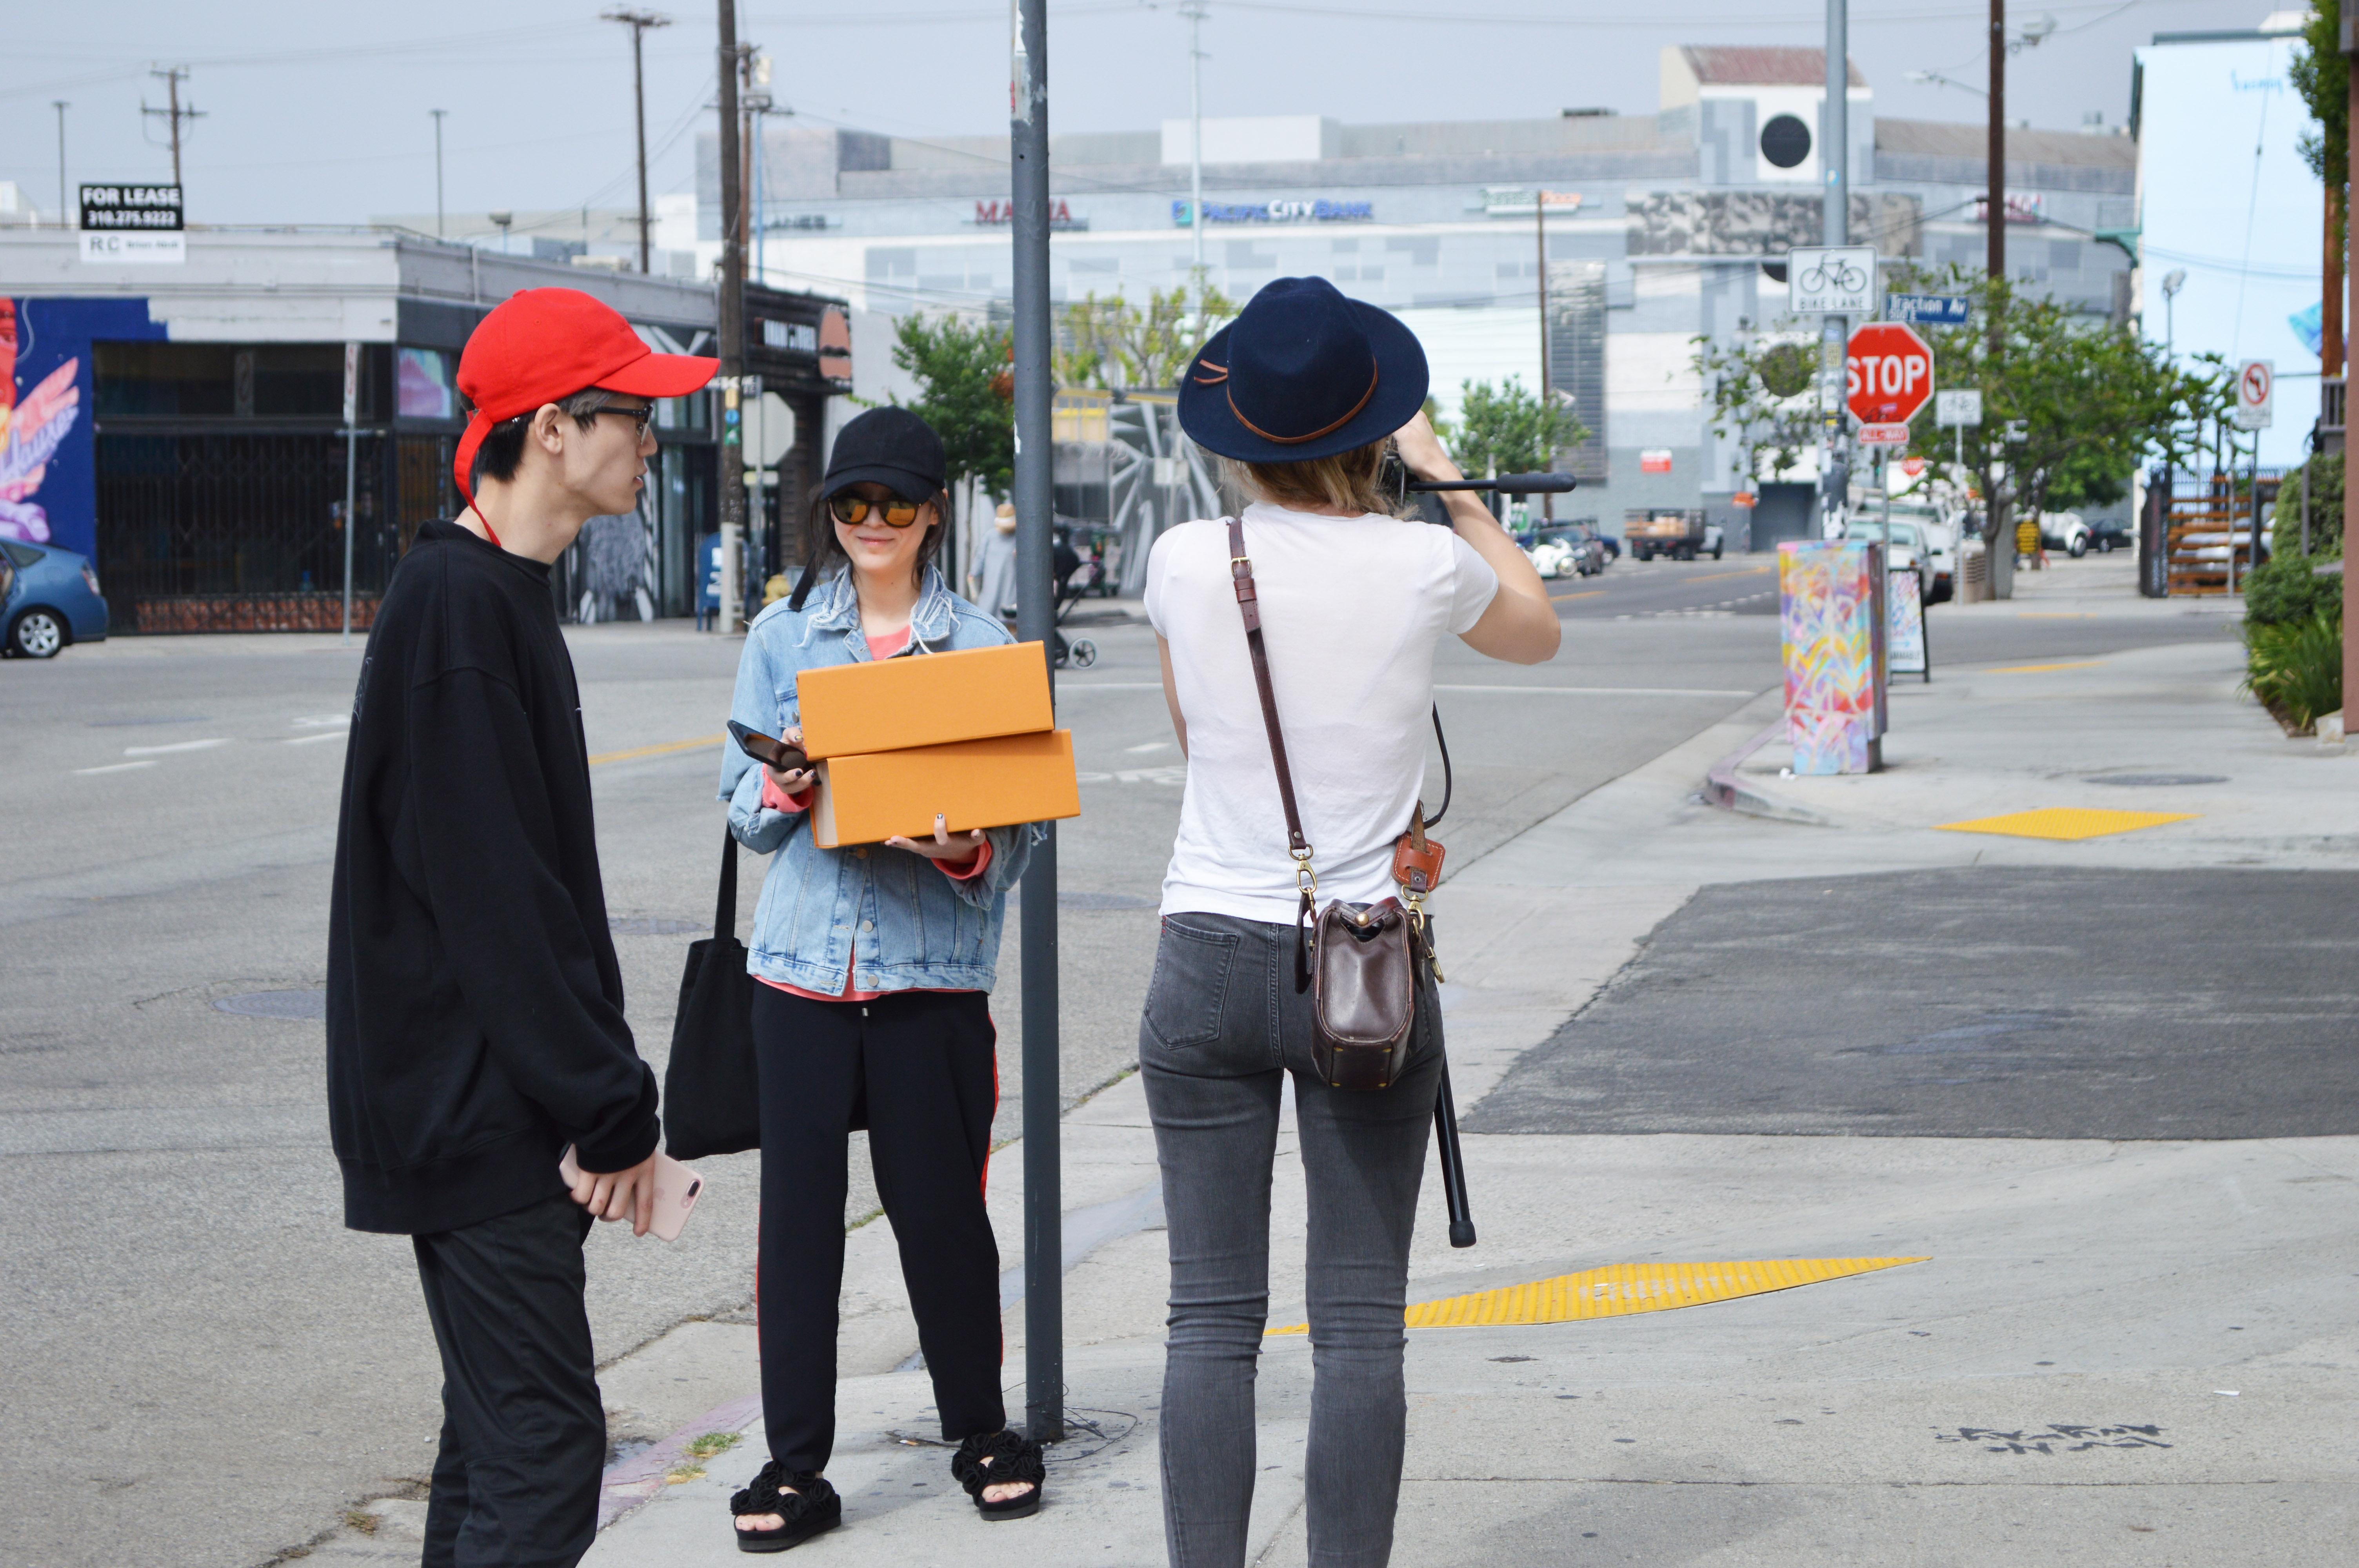 Los Angeles shoppers at the Louis Vuitton x Supreme pop-up